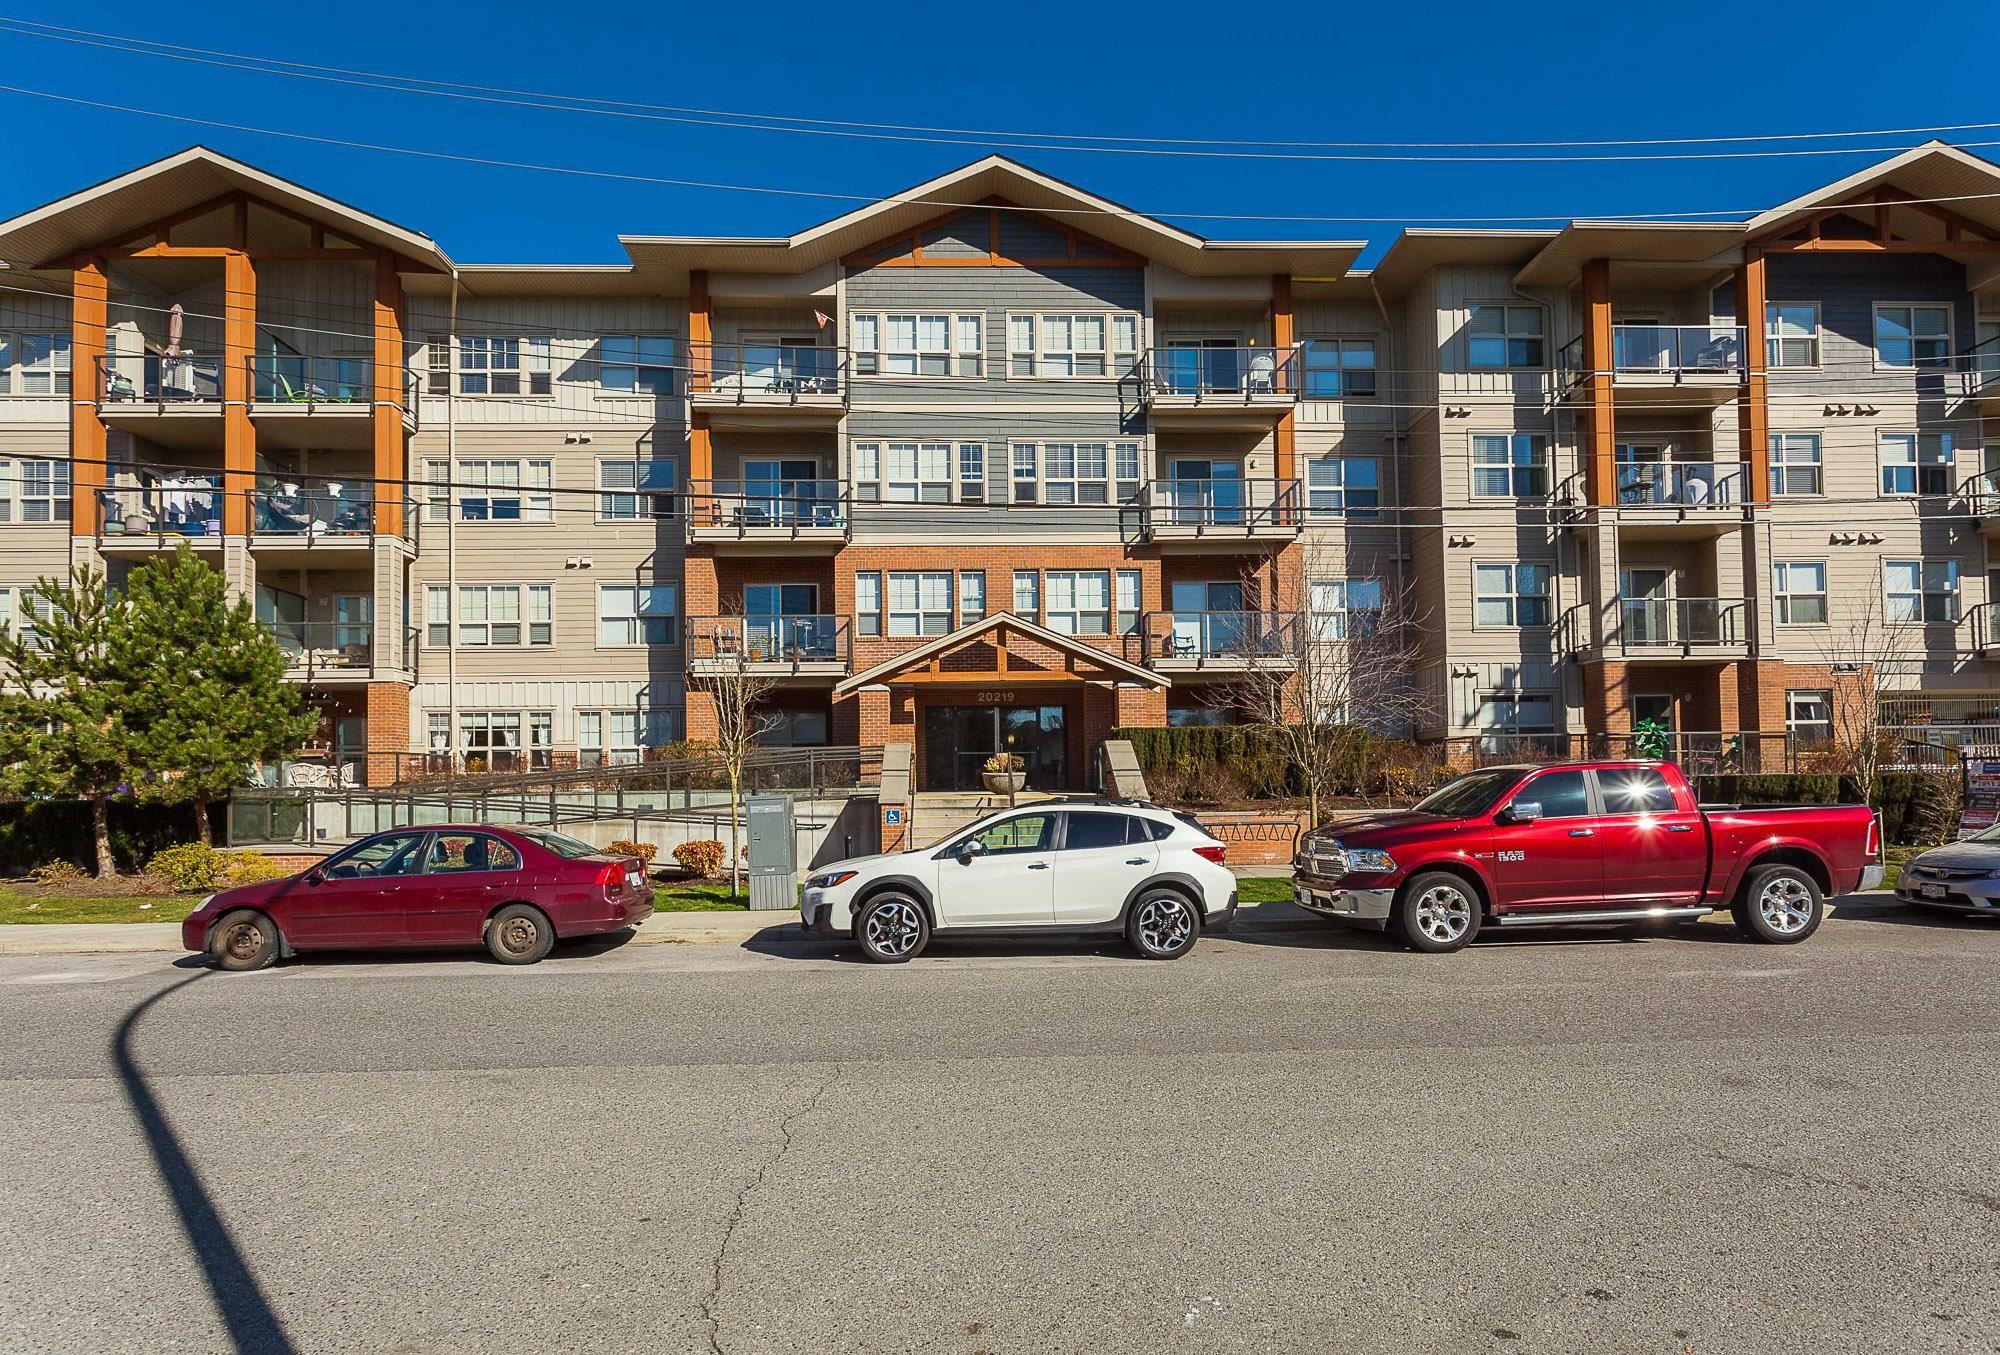 114 20219 54A AVENUE - Langley City Apartment/Condo for sale, 1 Bedroom (R2616172) - #1